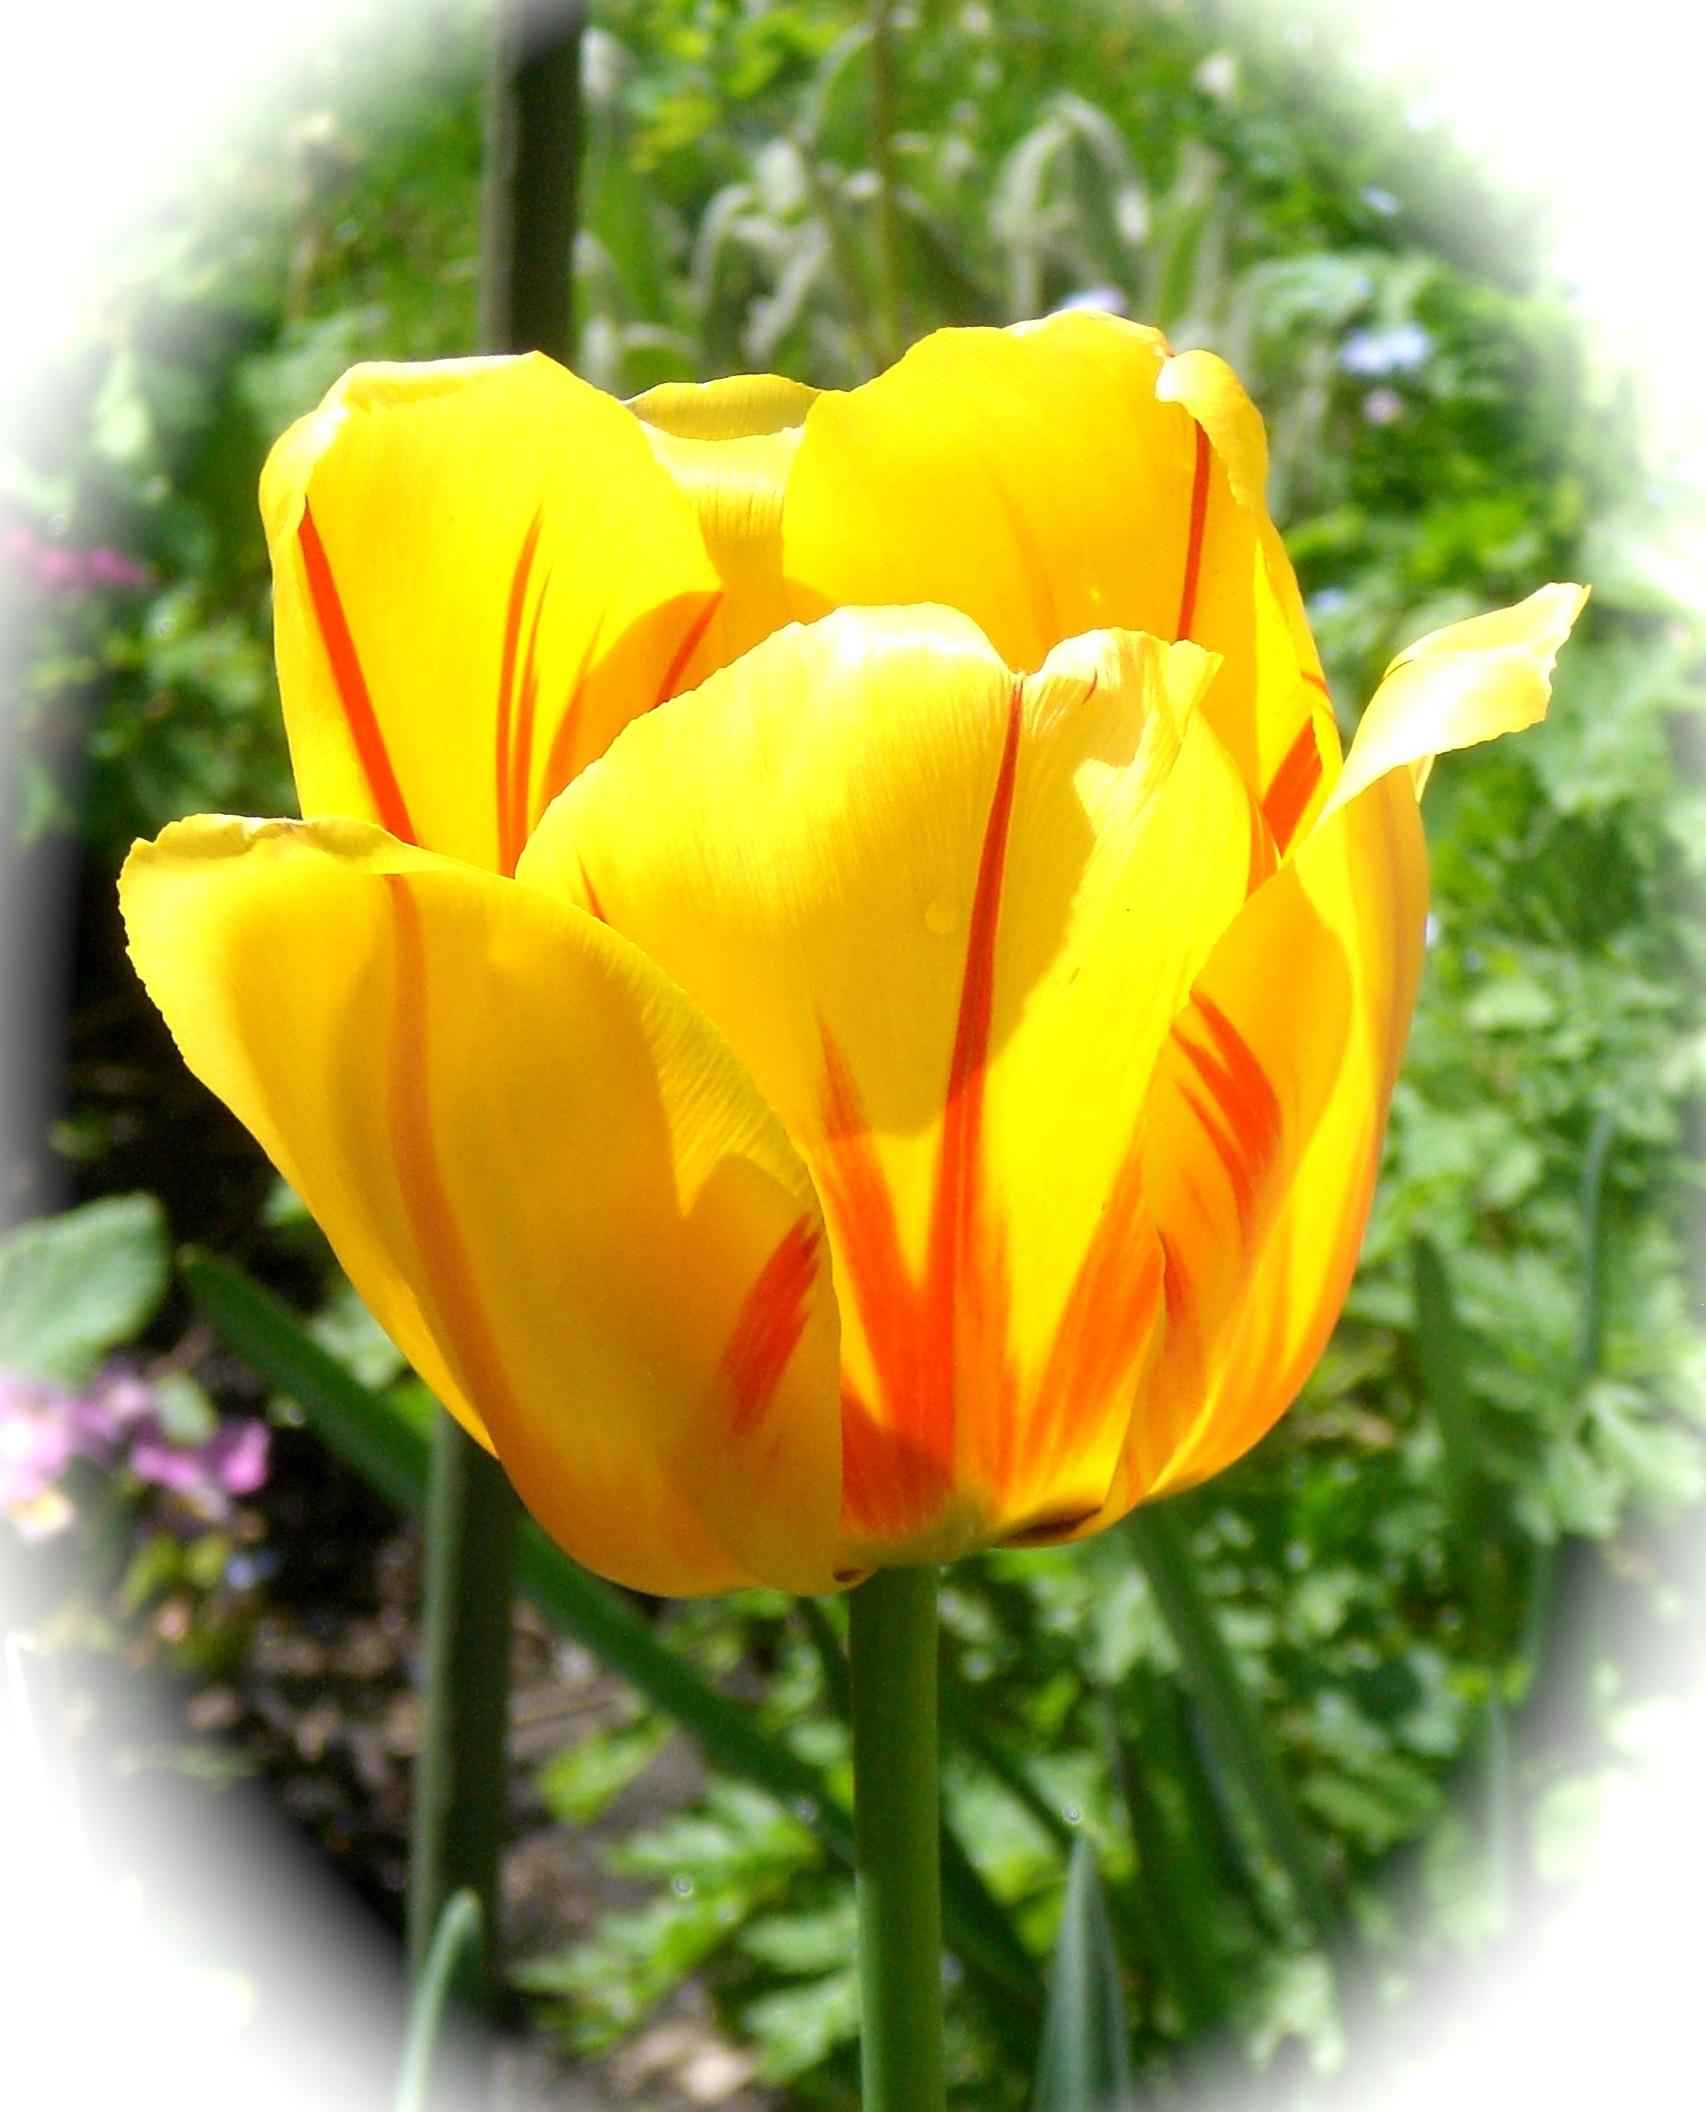 Fotos Gratis Flor Petalo Tulipan Primavera Amarillo Cerca